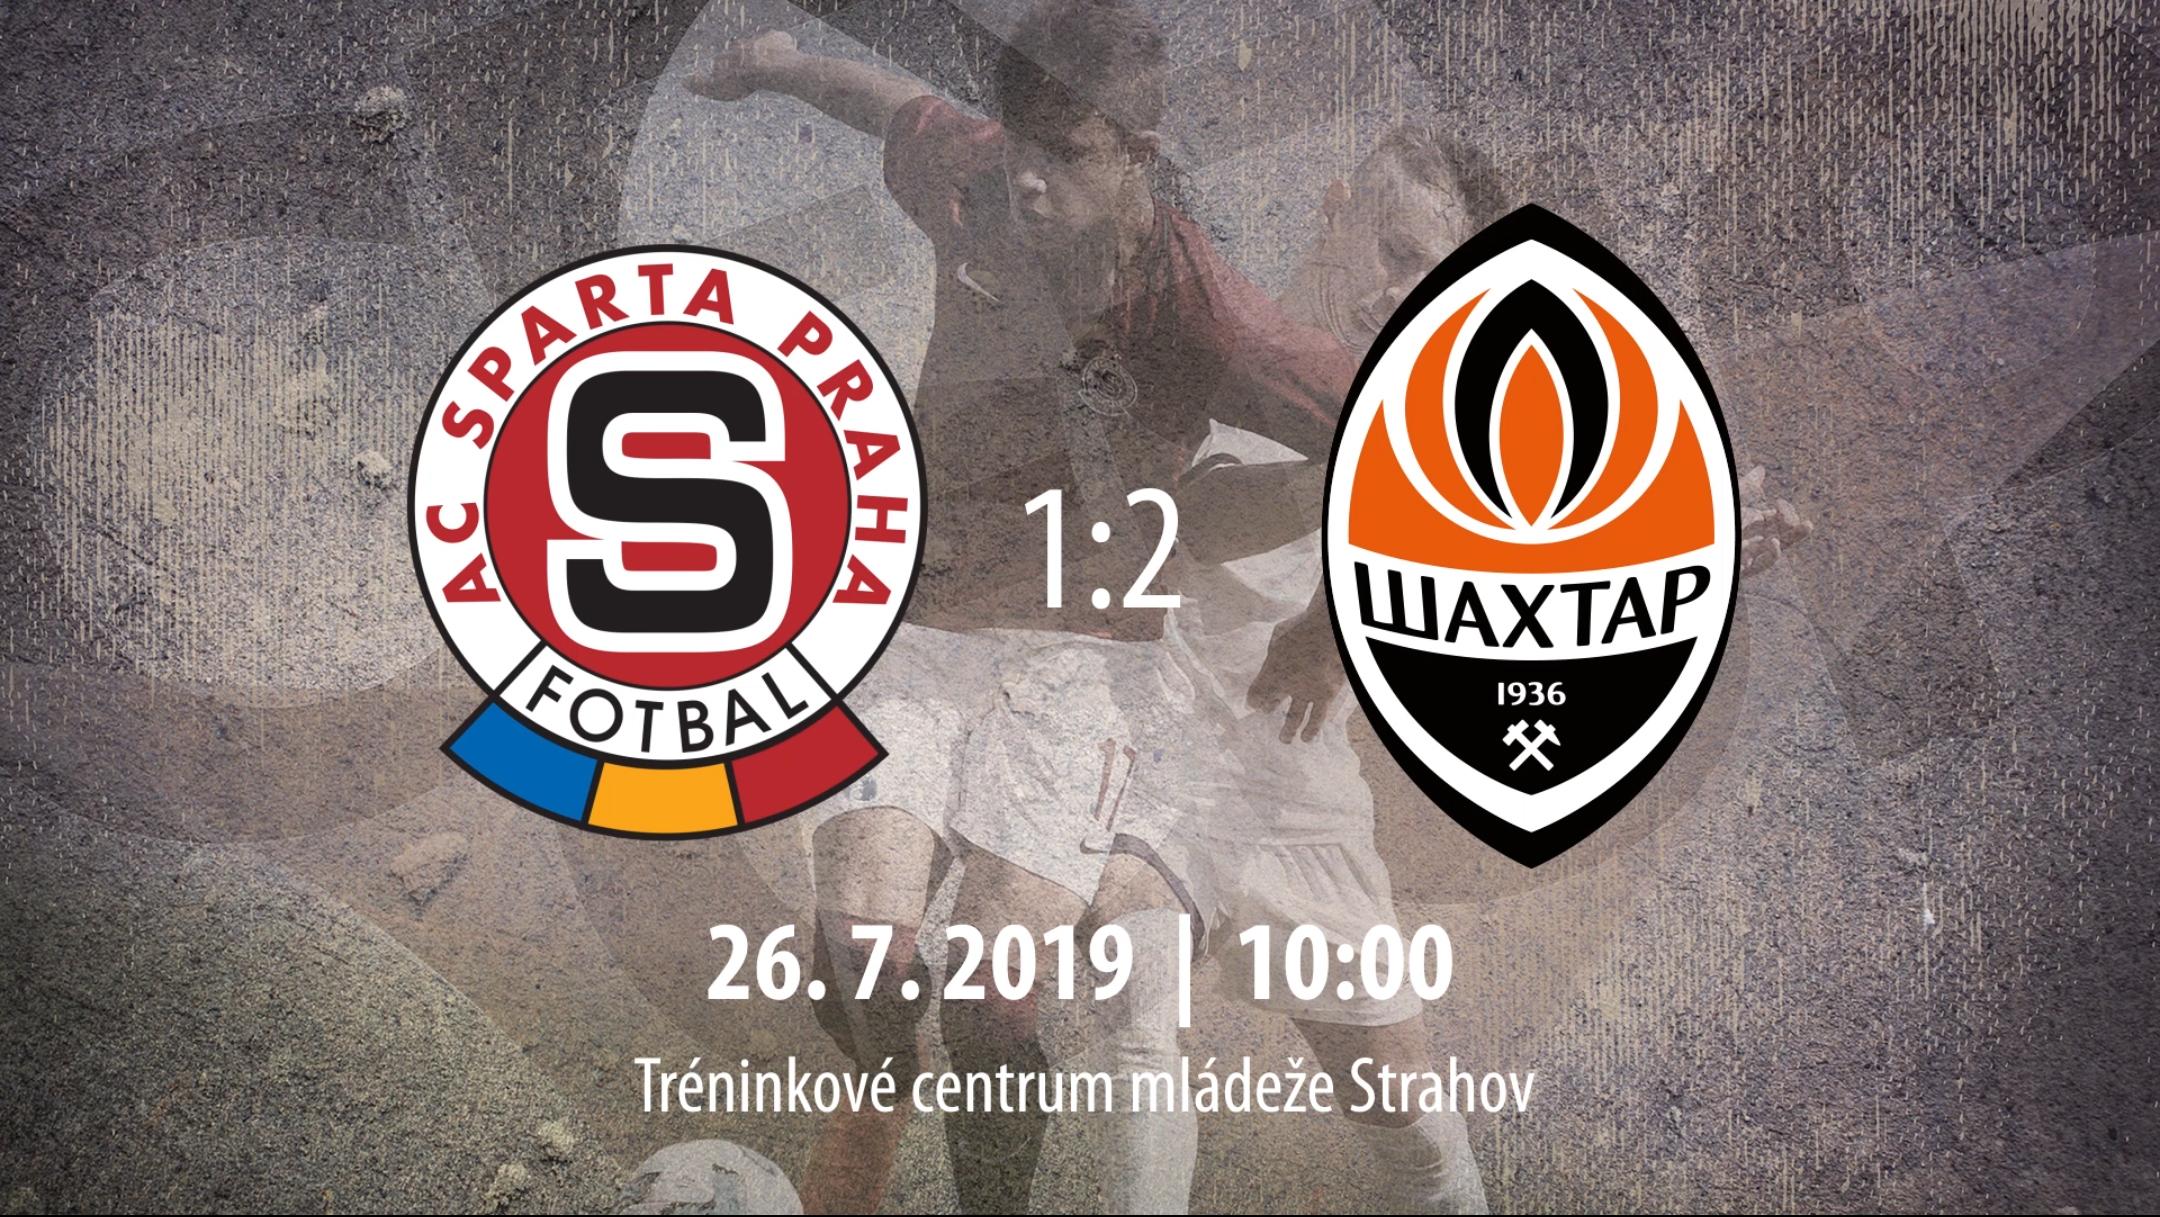 [HIGHLIGHTS] CEE Cup 2019: AC Sparta Praha vs FC Shakhtar Donetsk 1-2